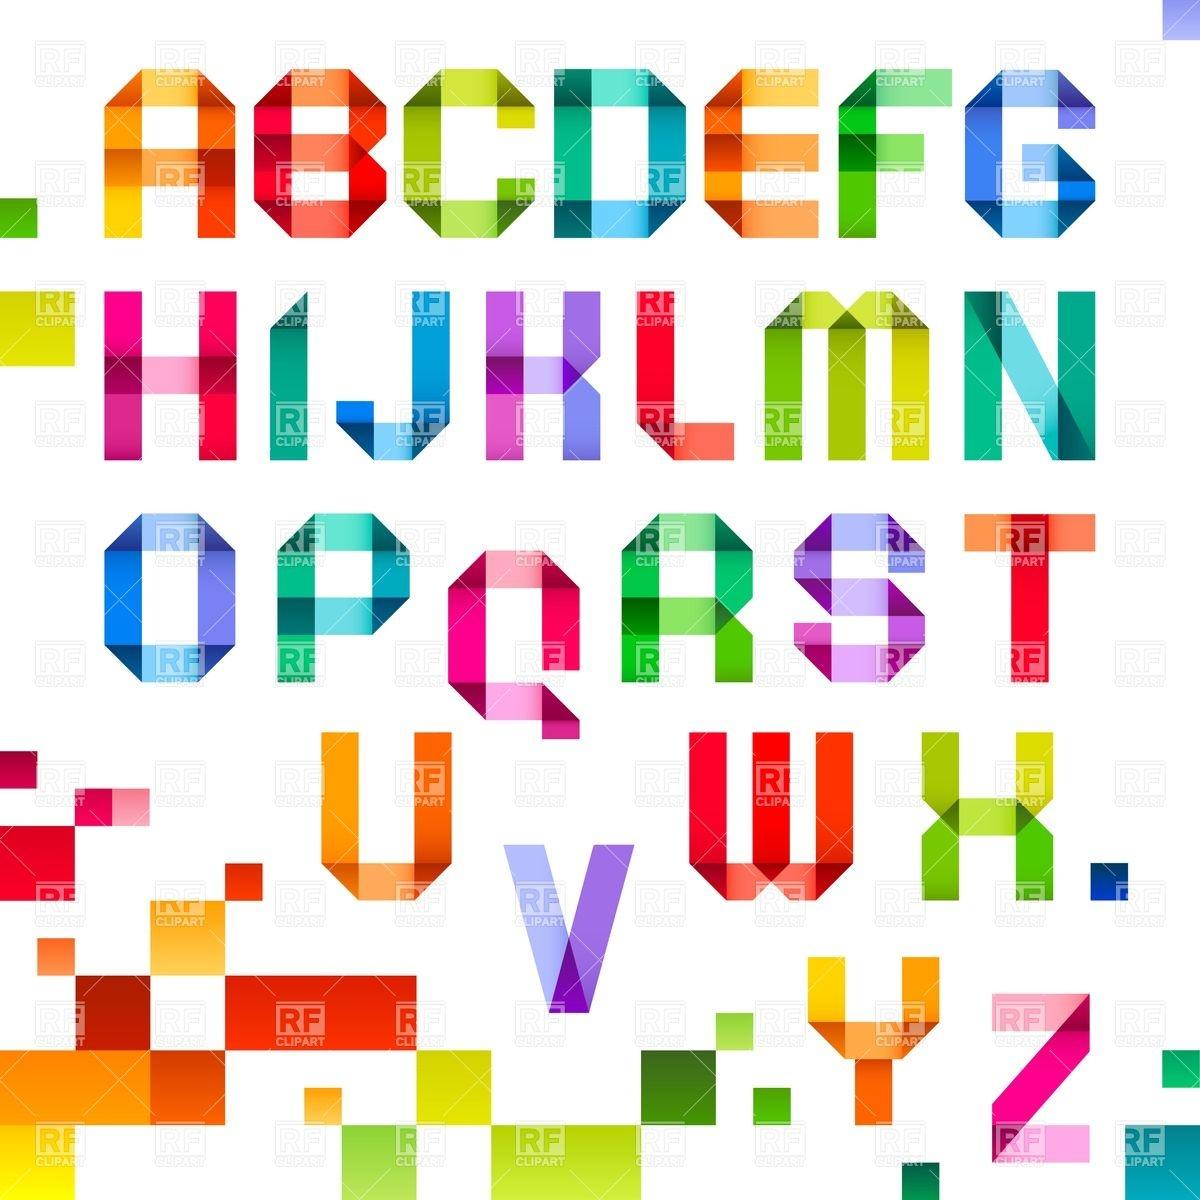 Free Clip Art Letter Fonts